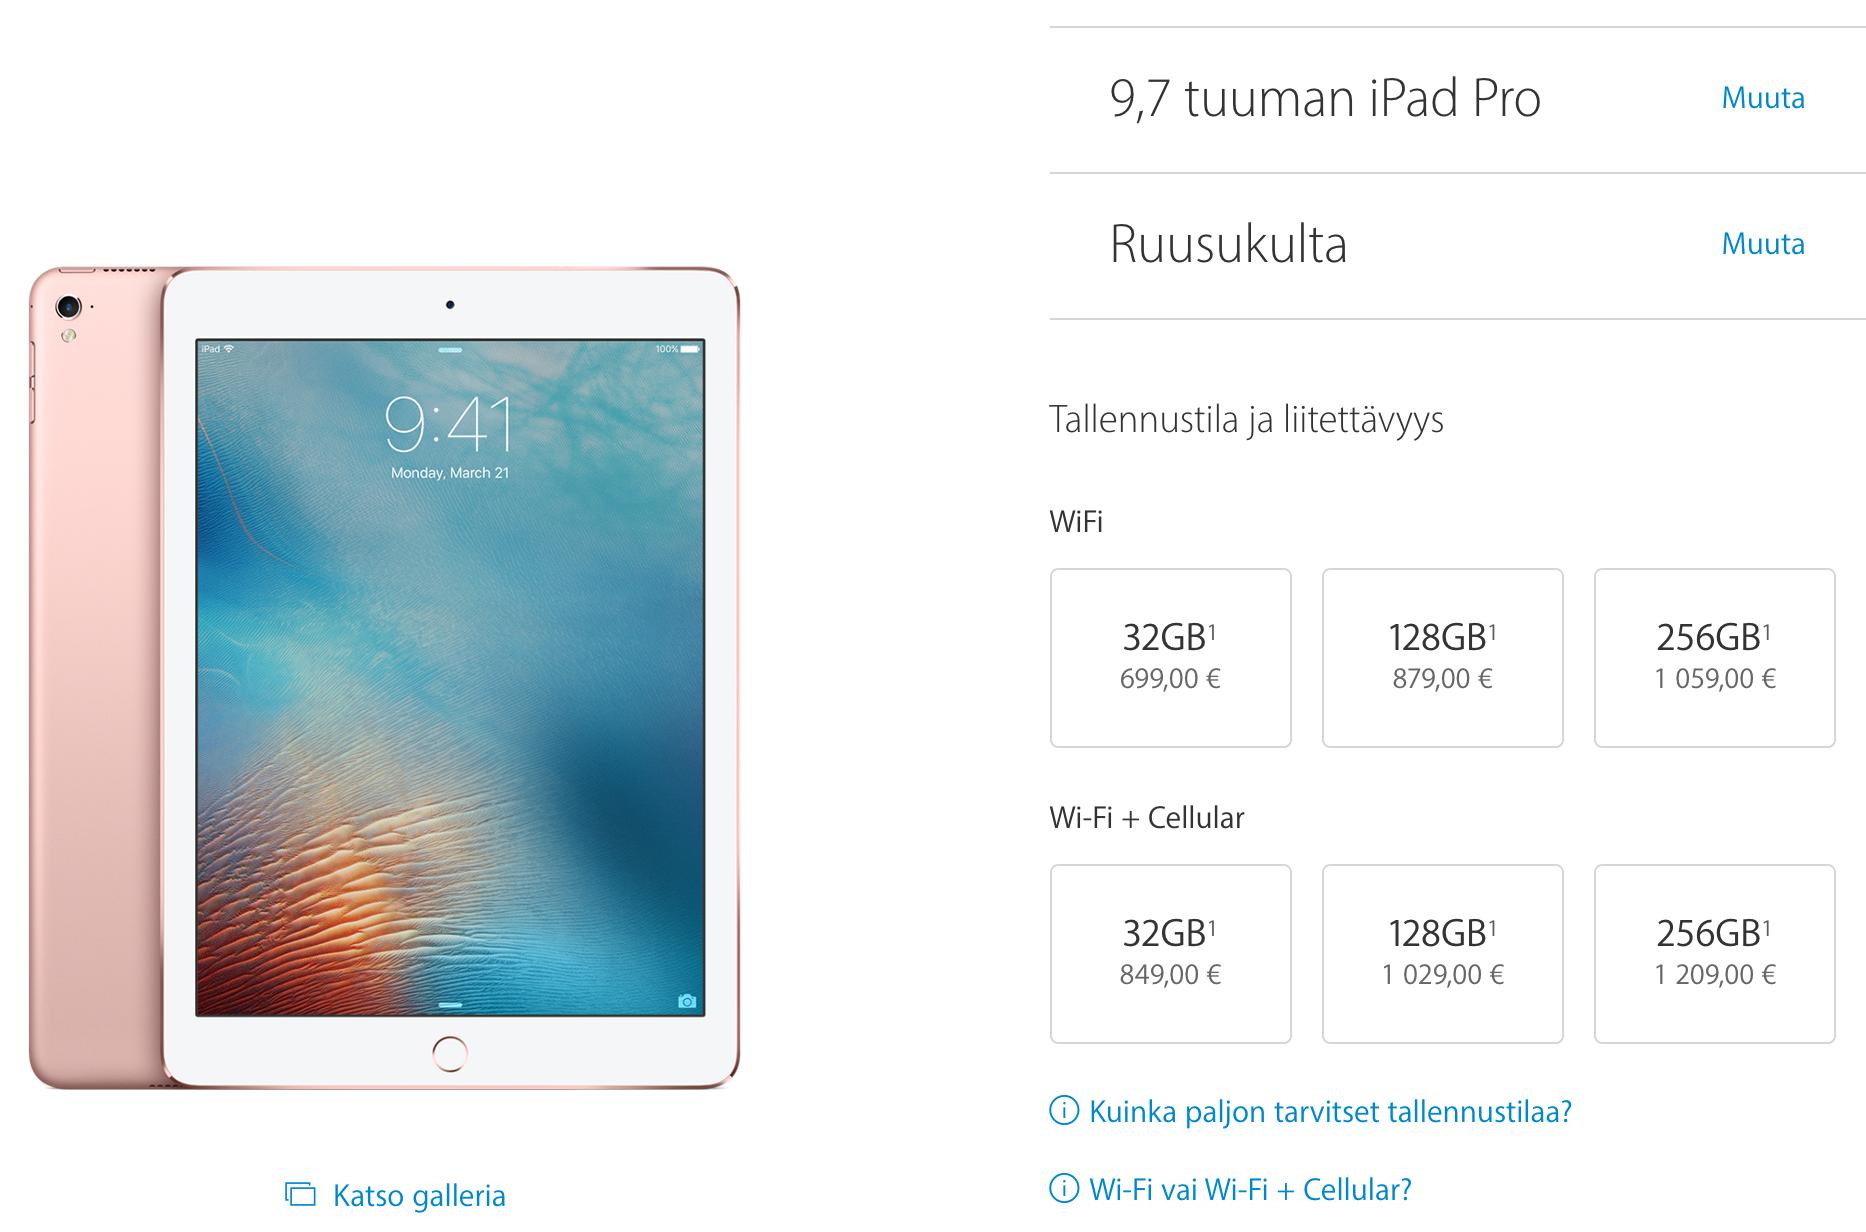 Apple iPad mini 2 WiFi 16, gB, price in the Philippines and